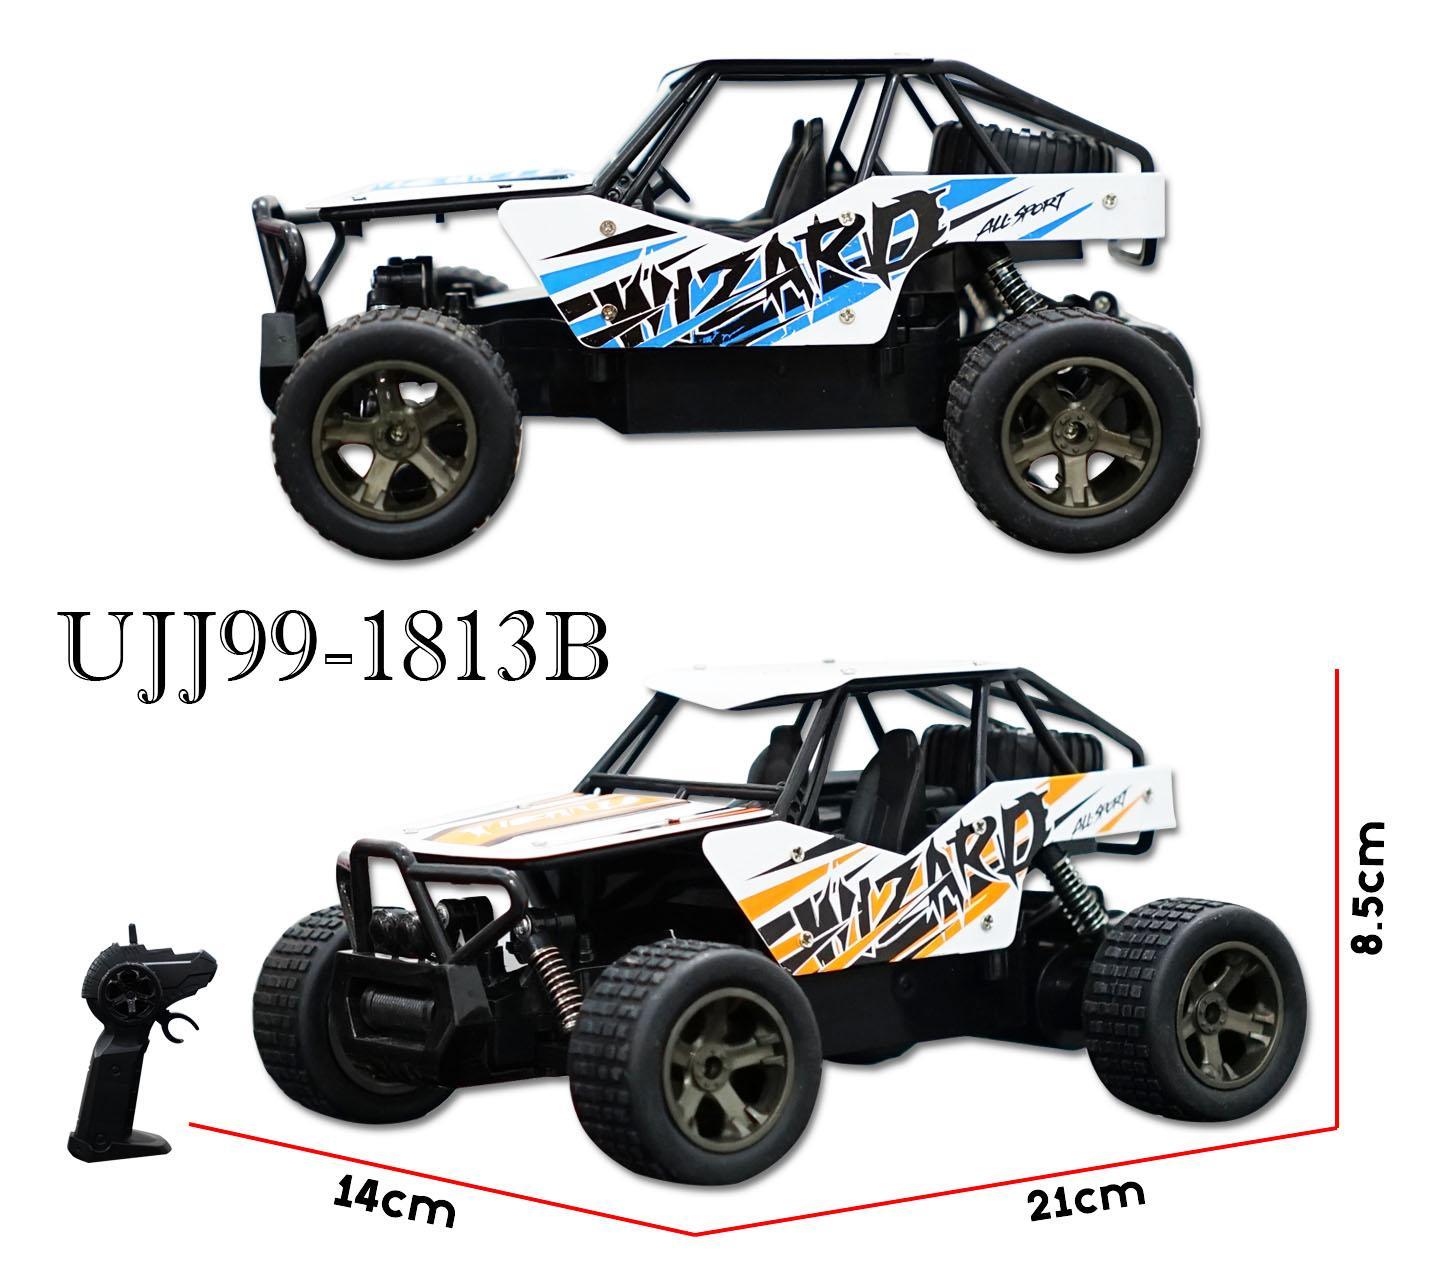 RKJ Mainan Anak RC Mobil Remot Cheetah King Wizard 2.4GHz 1:18 UJ99-1813B